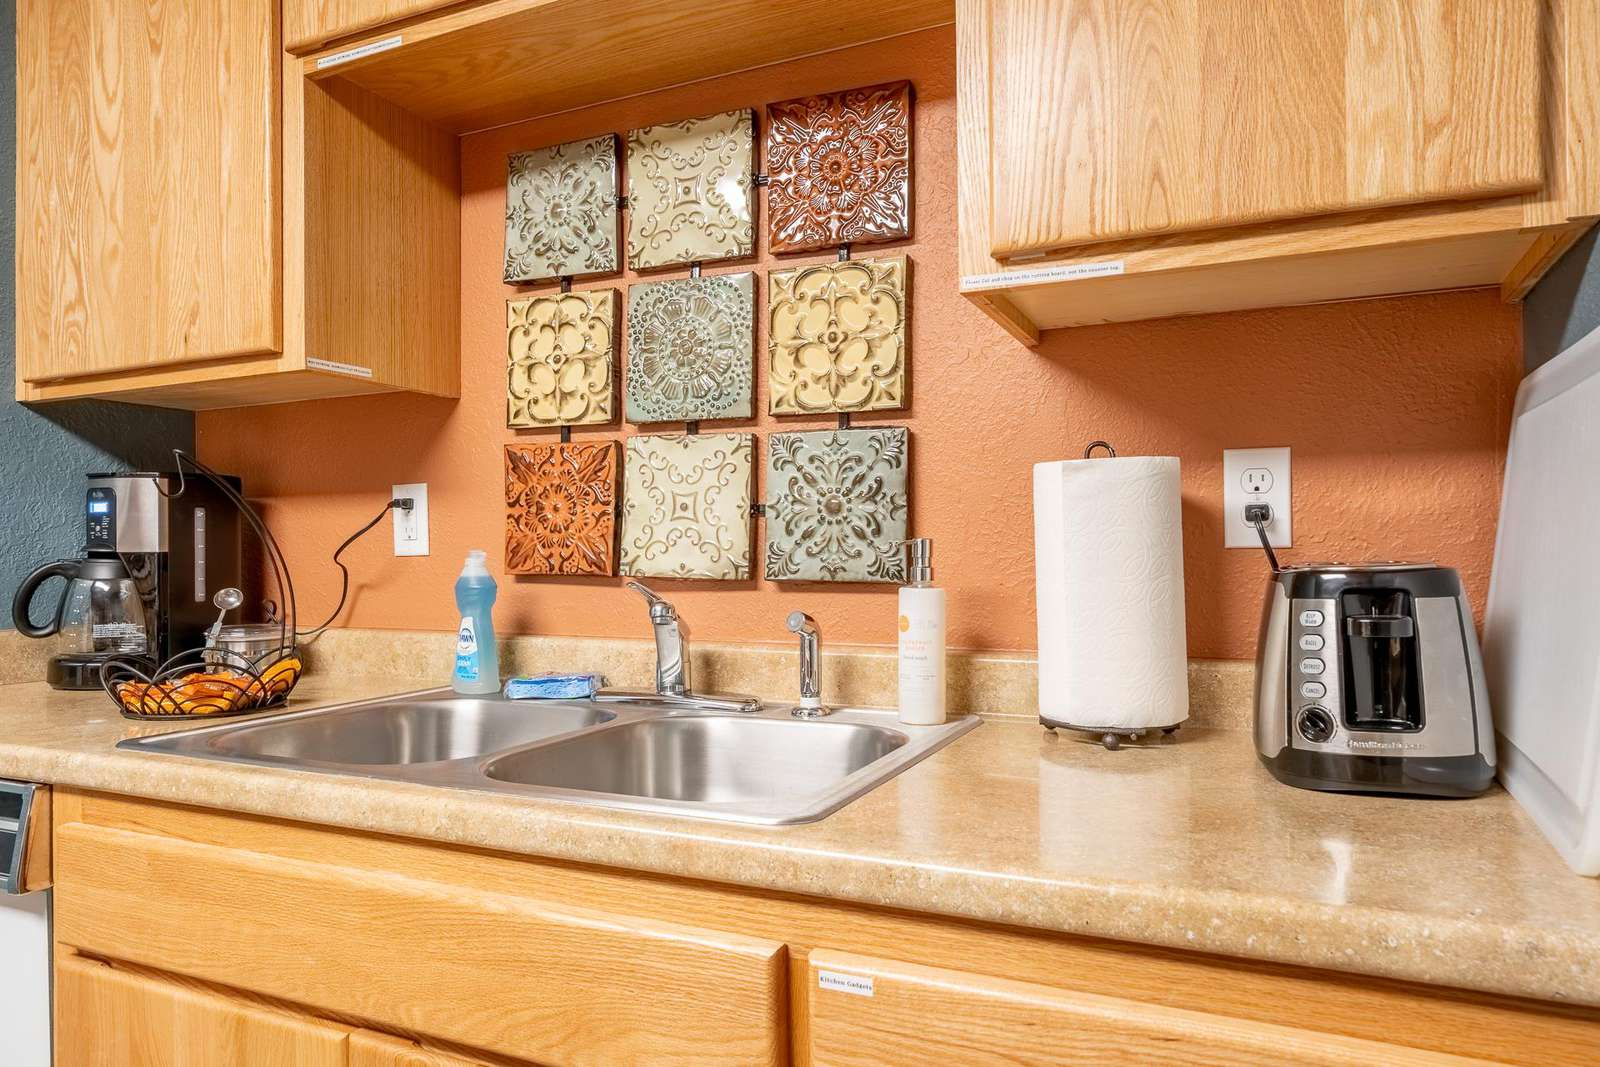 Kitchen - Organic coffee an English muffins provided